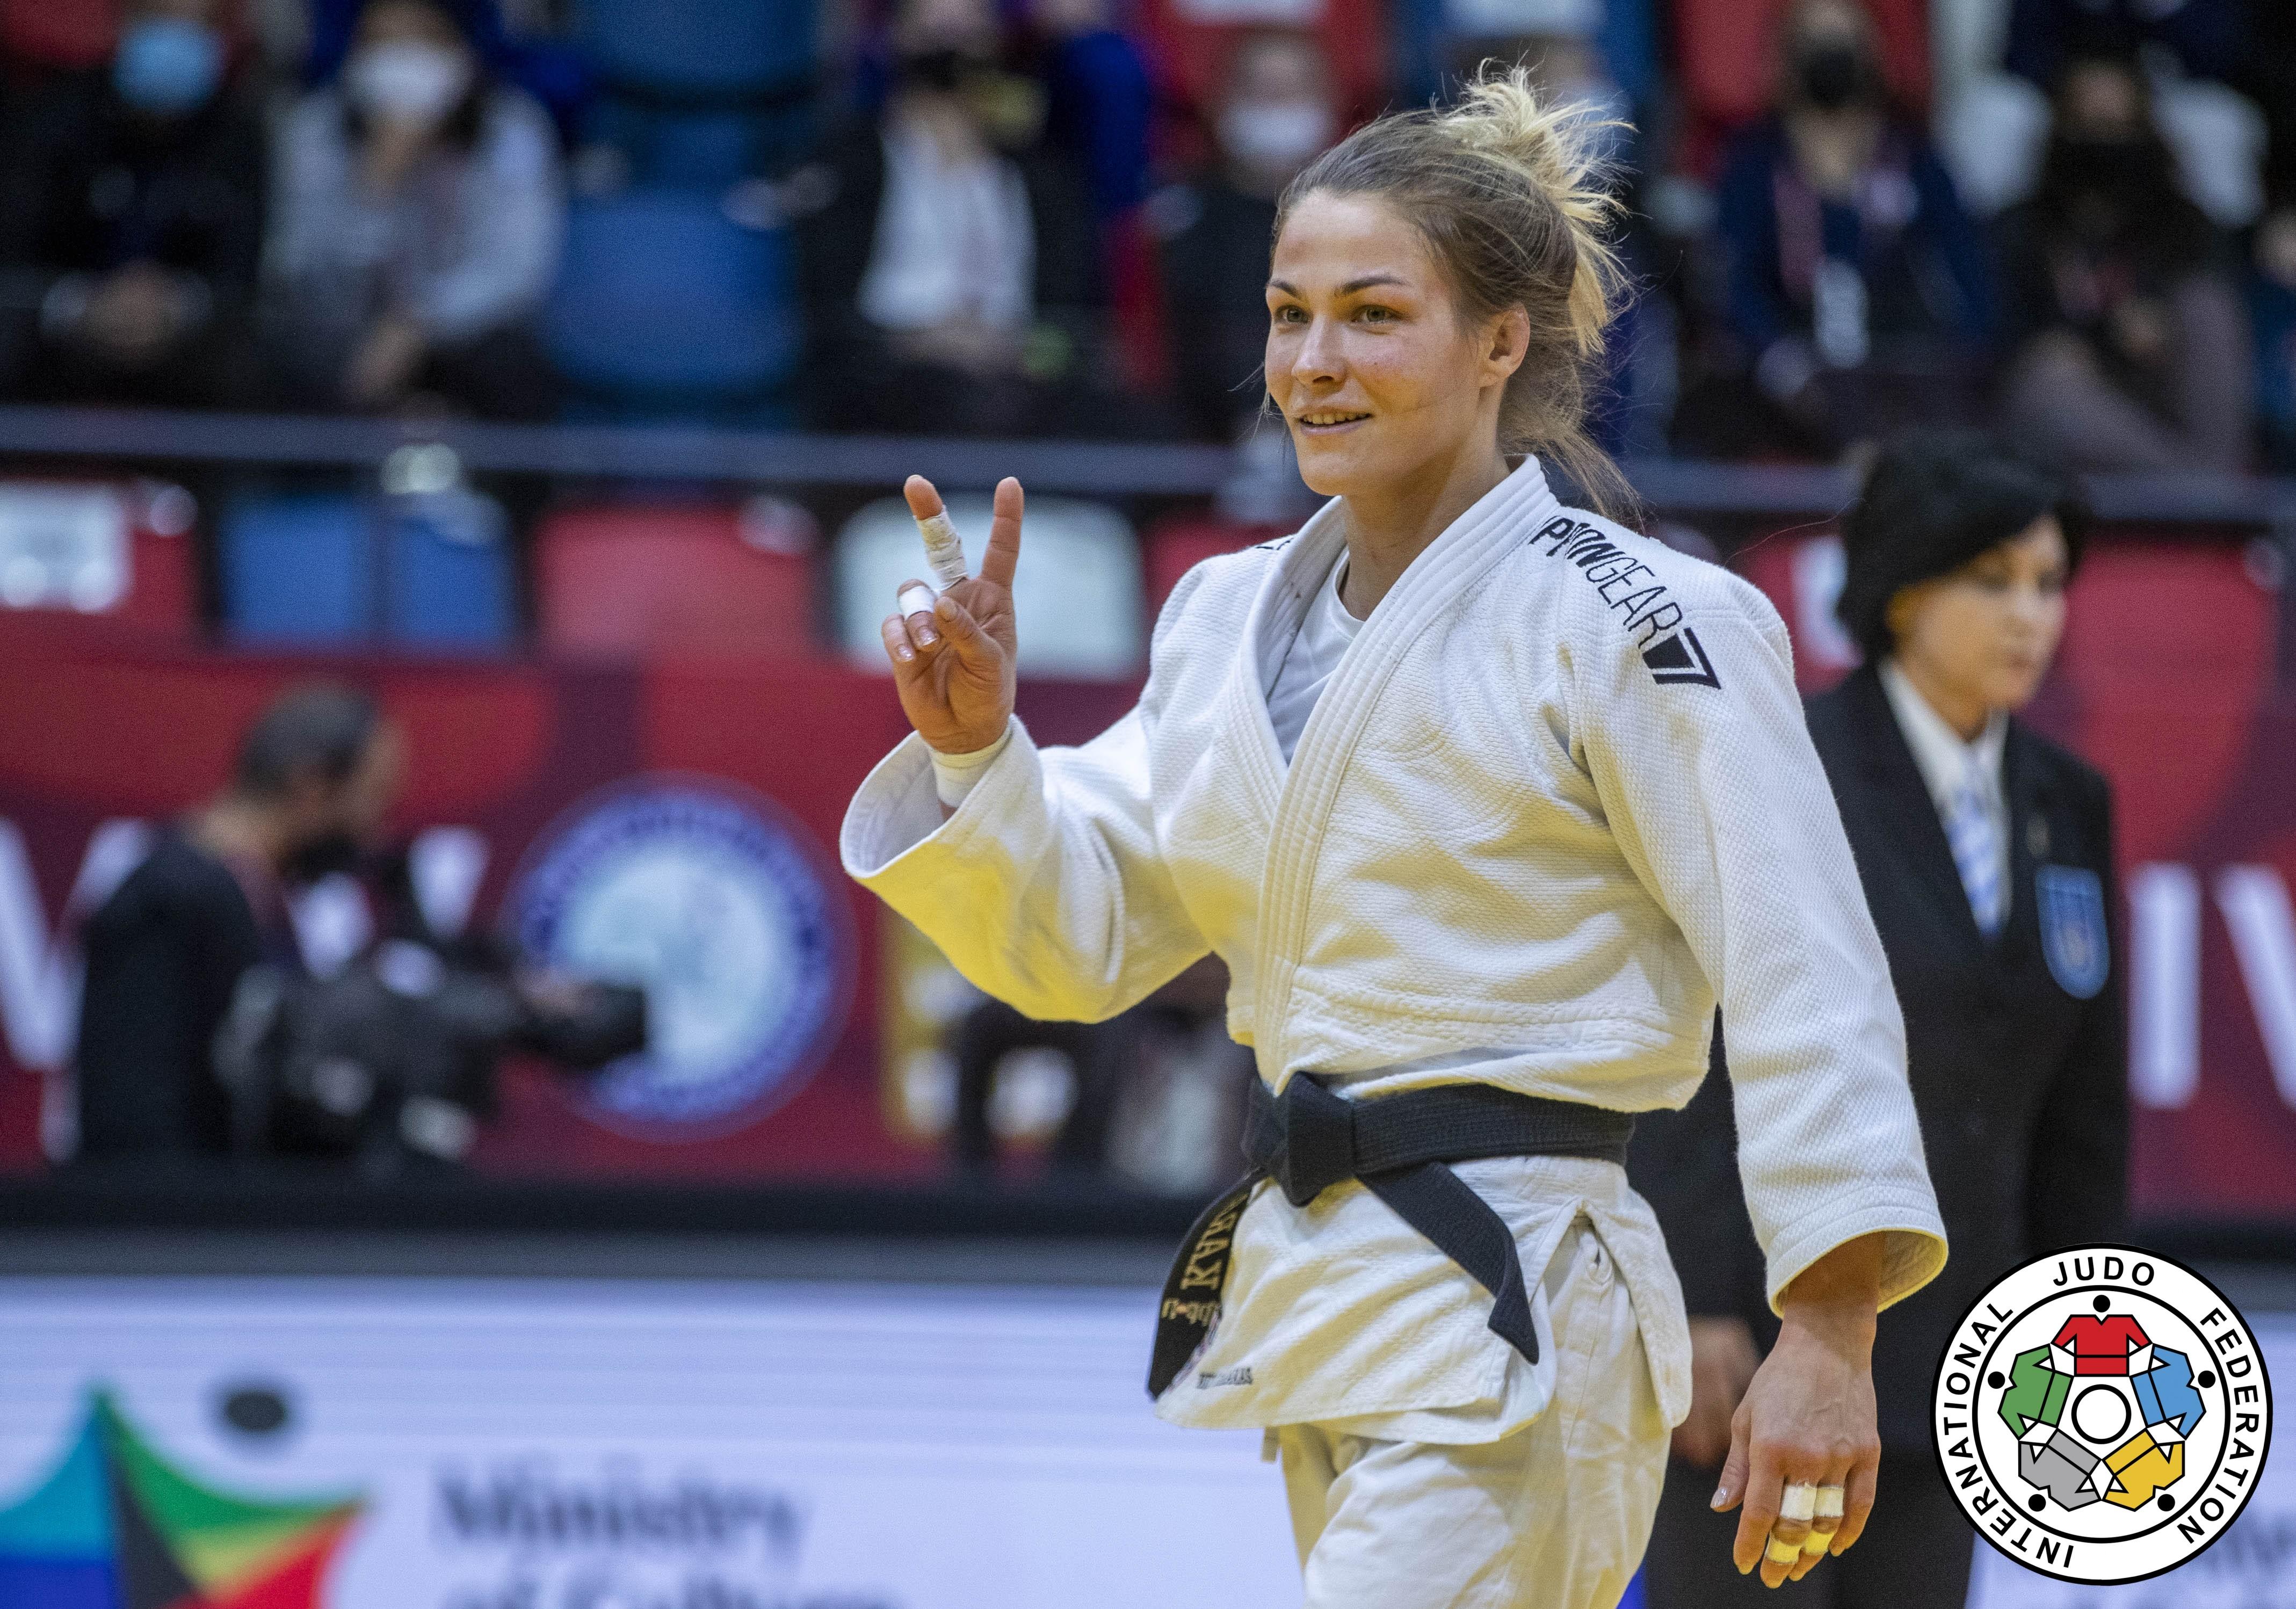 Judo-World-Tour-2021-Grand-slam-Tel-Aviv-KARAKAS-Hedvig-Hungary-57-kg-bronze